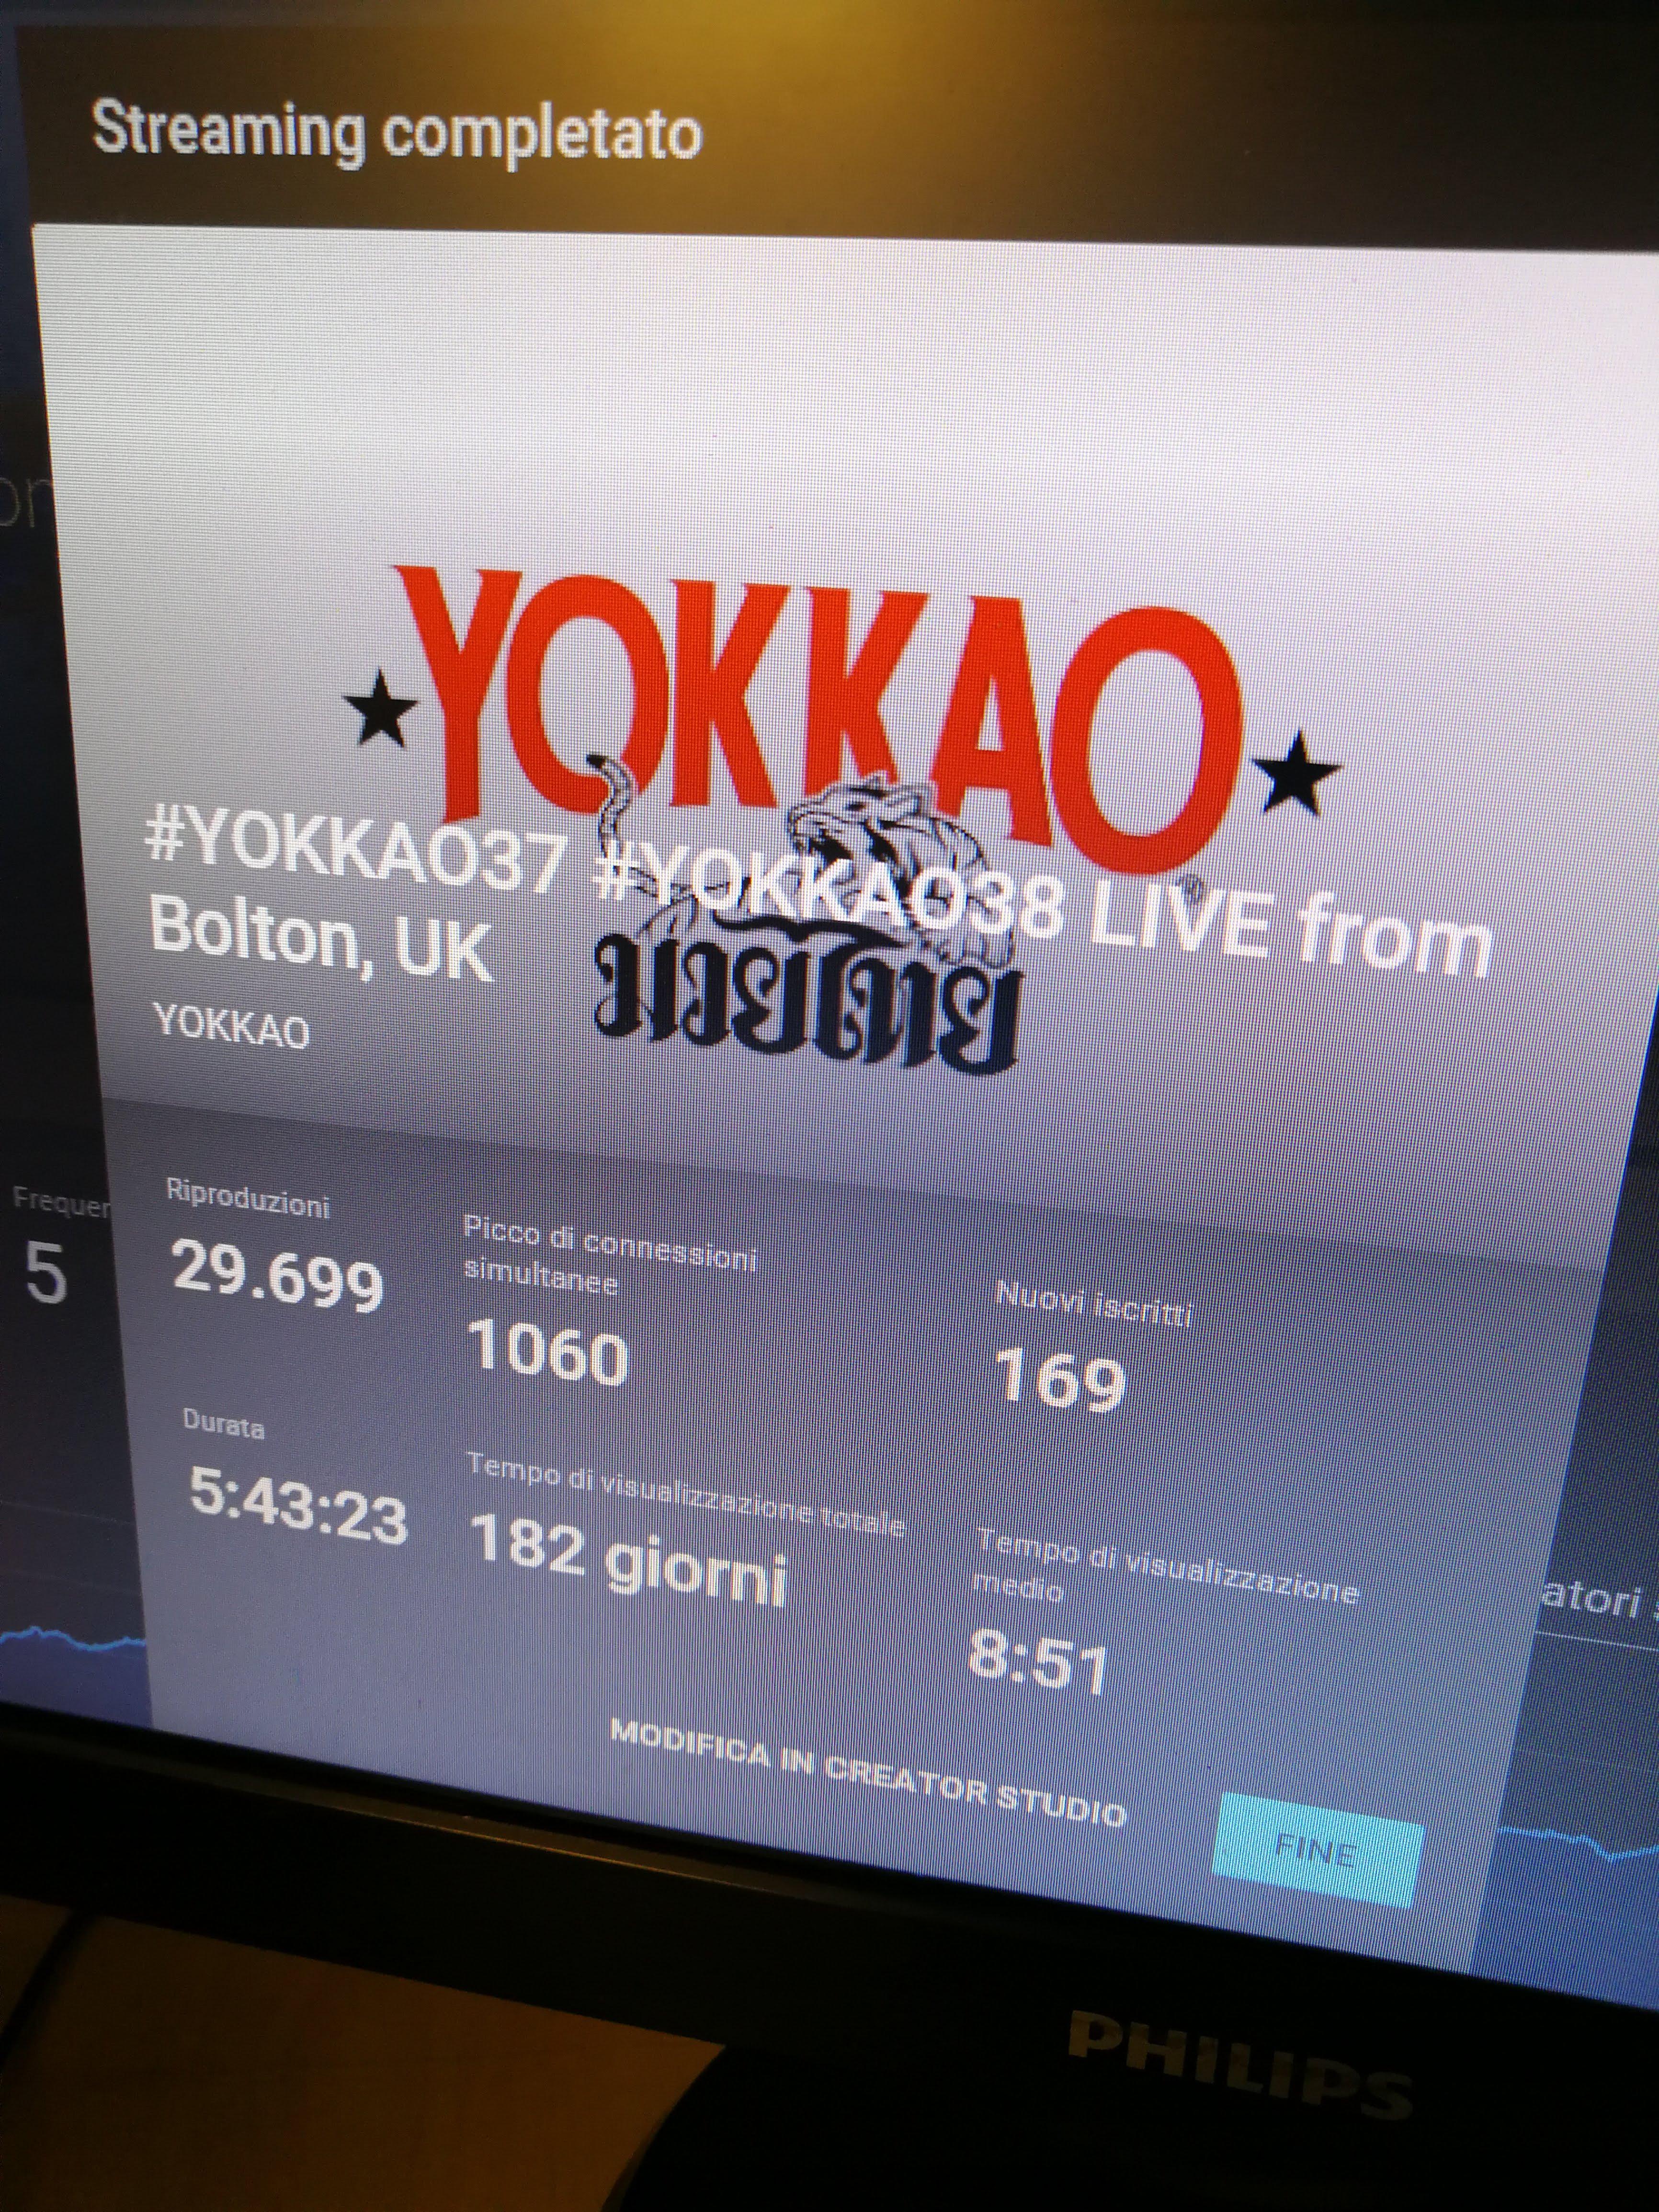 Yokkao - Streaming Statistics